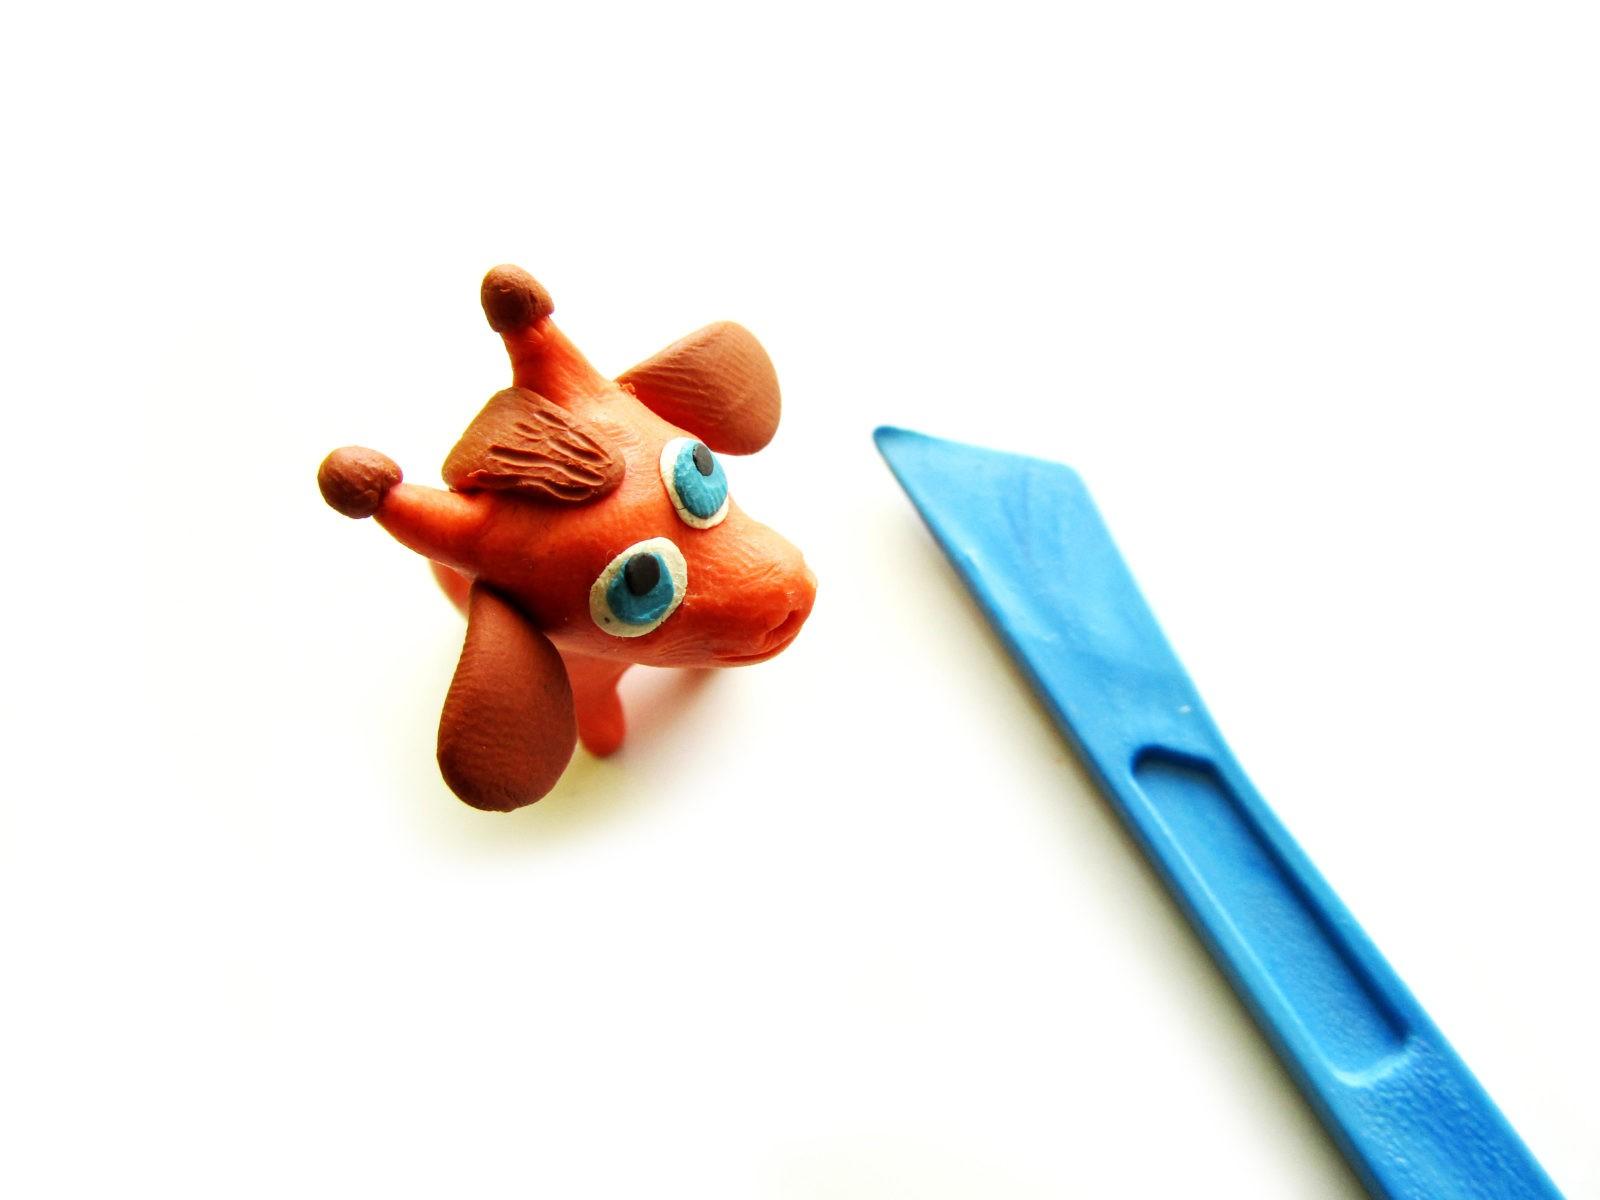 Как слепить жирафа из пластилина - 10